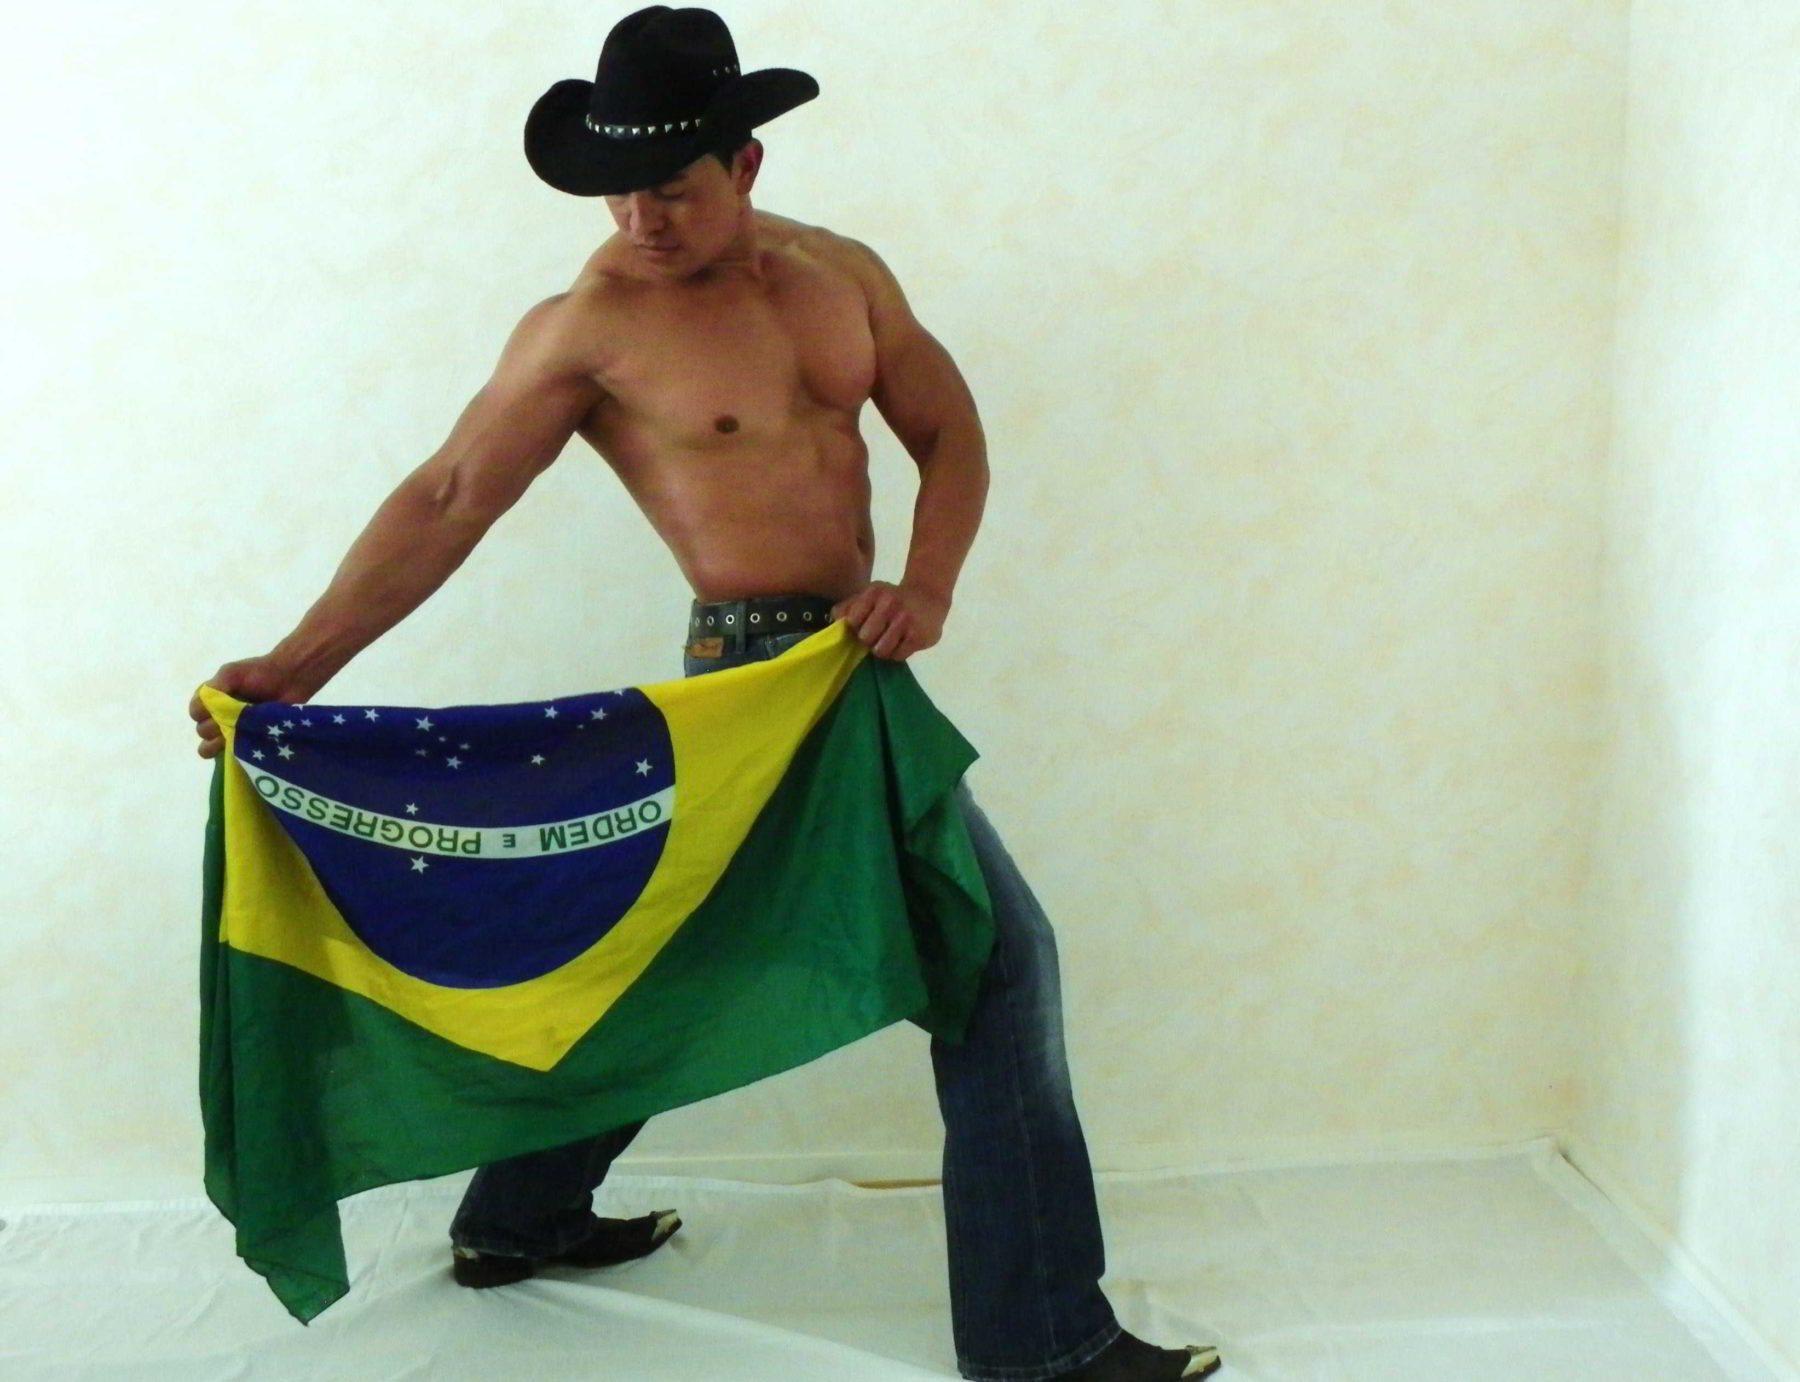 Stripteaseur Dole Juan